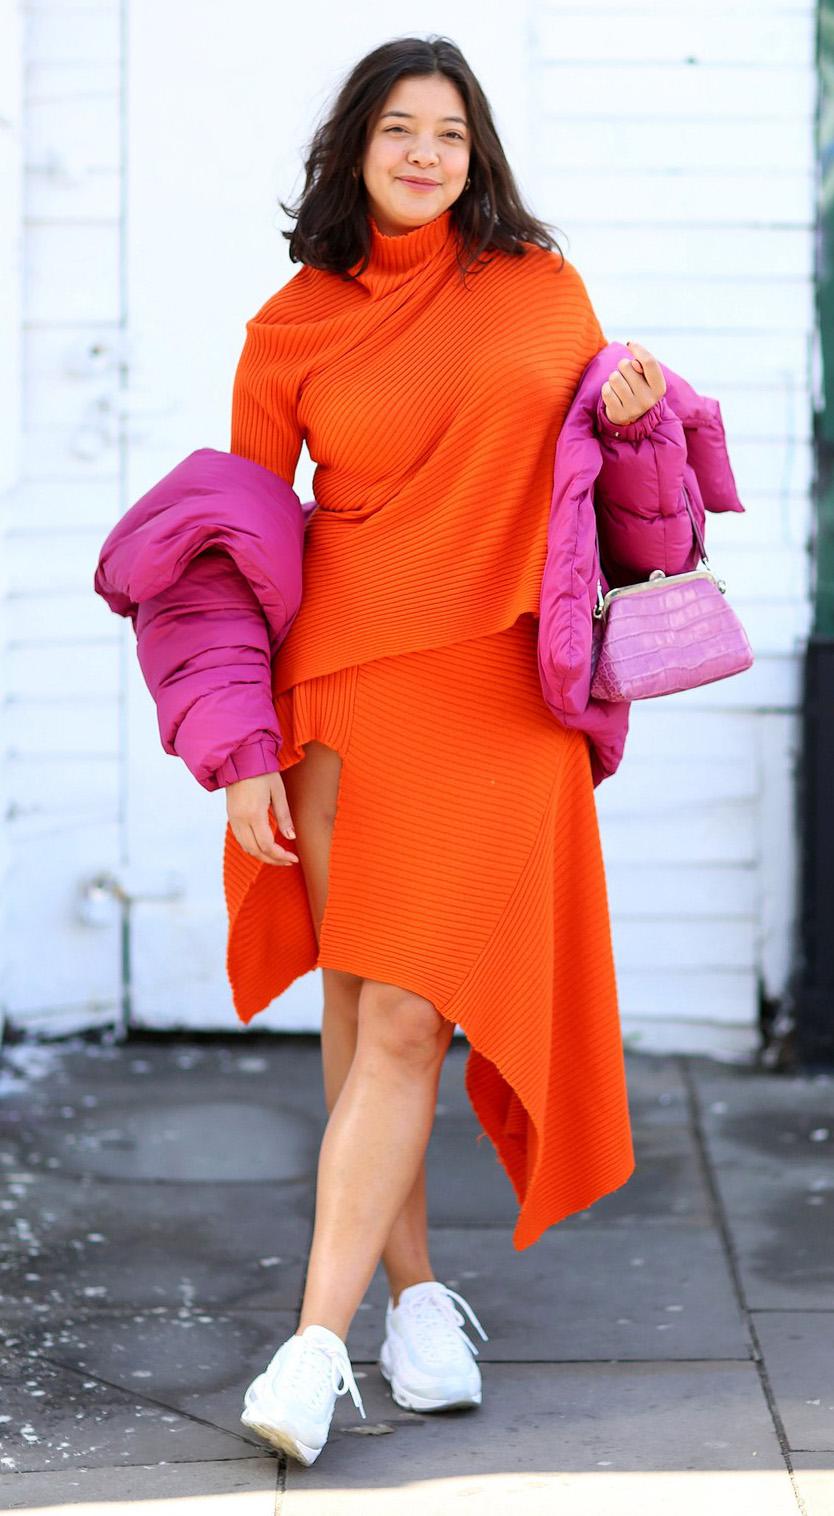 orange-midi-skirt-orange-sweater-turtleneck-pink-bag-hairr-pink-magenta-jacket-coat-puffer-lob-white-shoe-sneakers-spring-summer-lunch.jpg